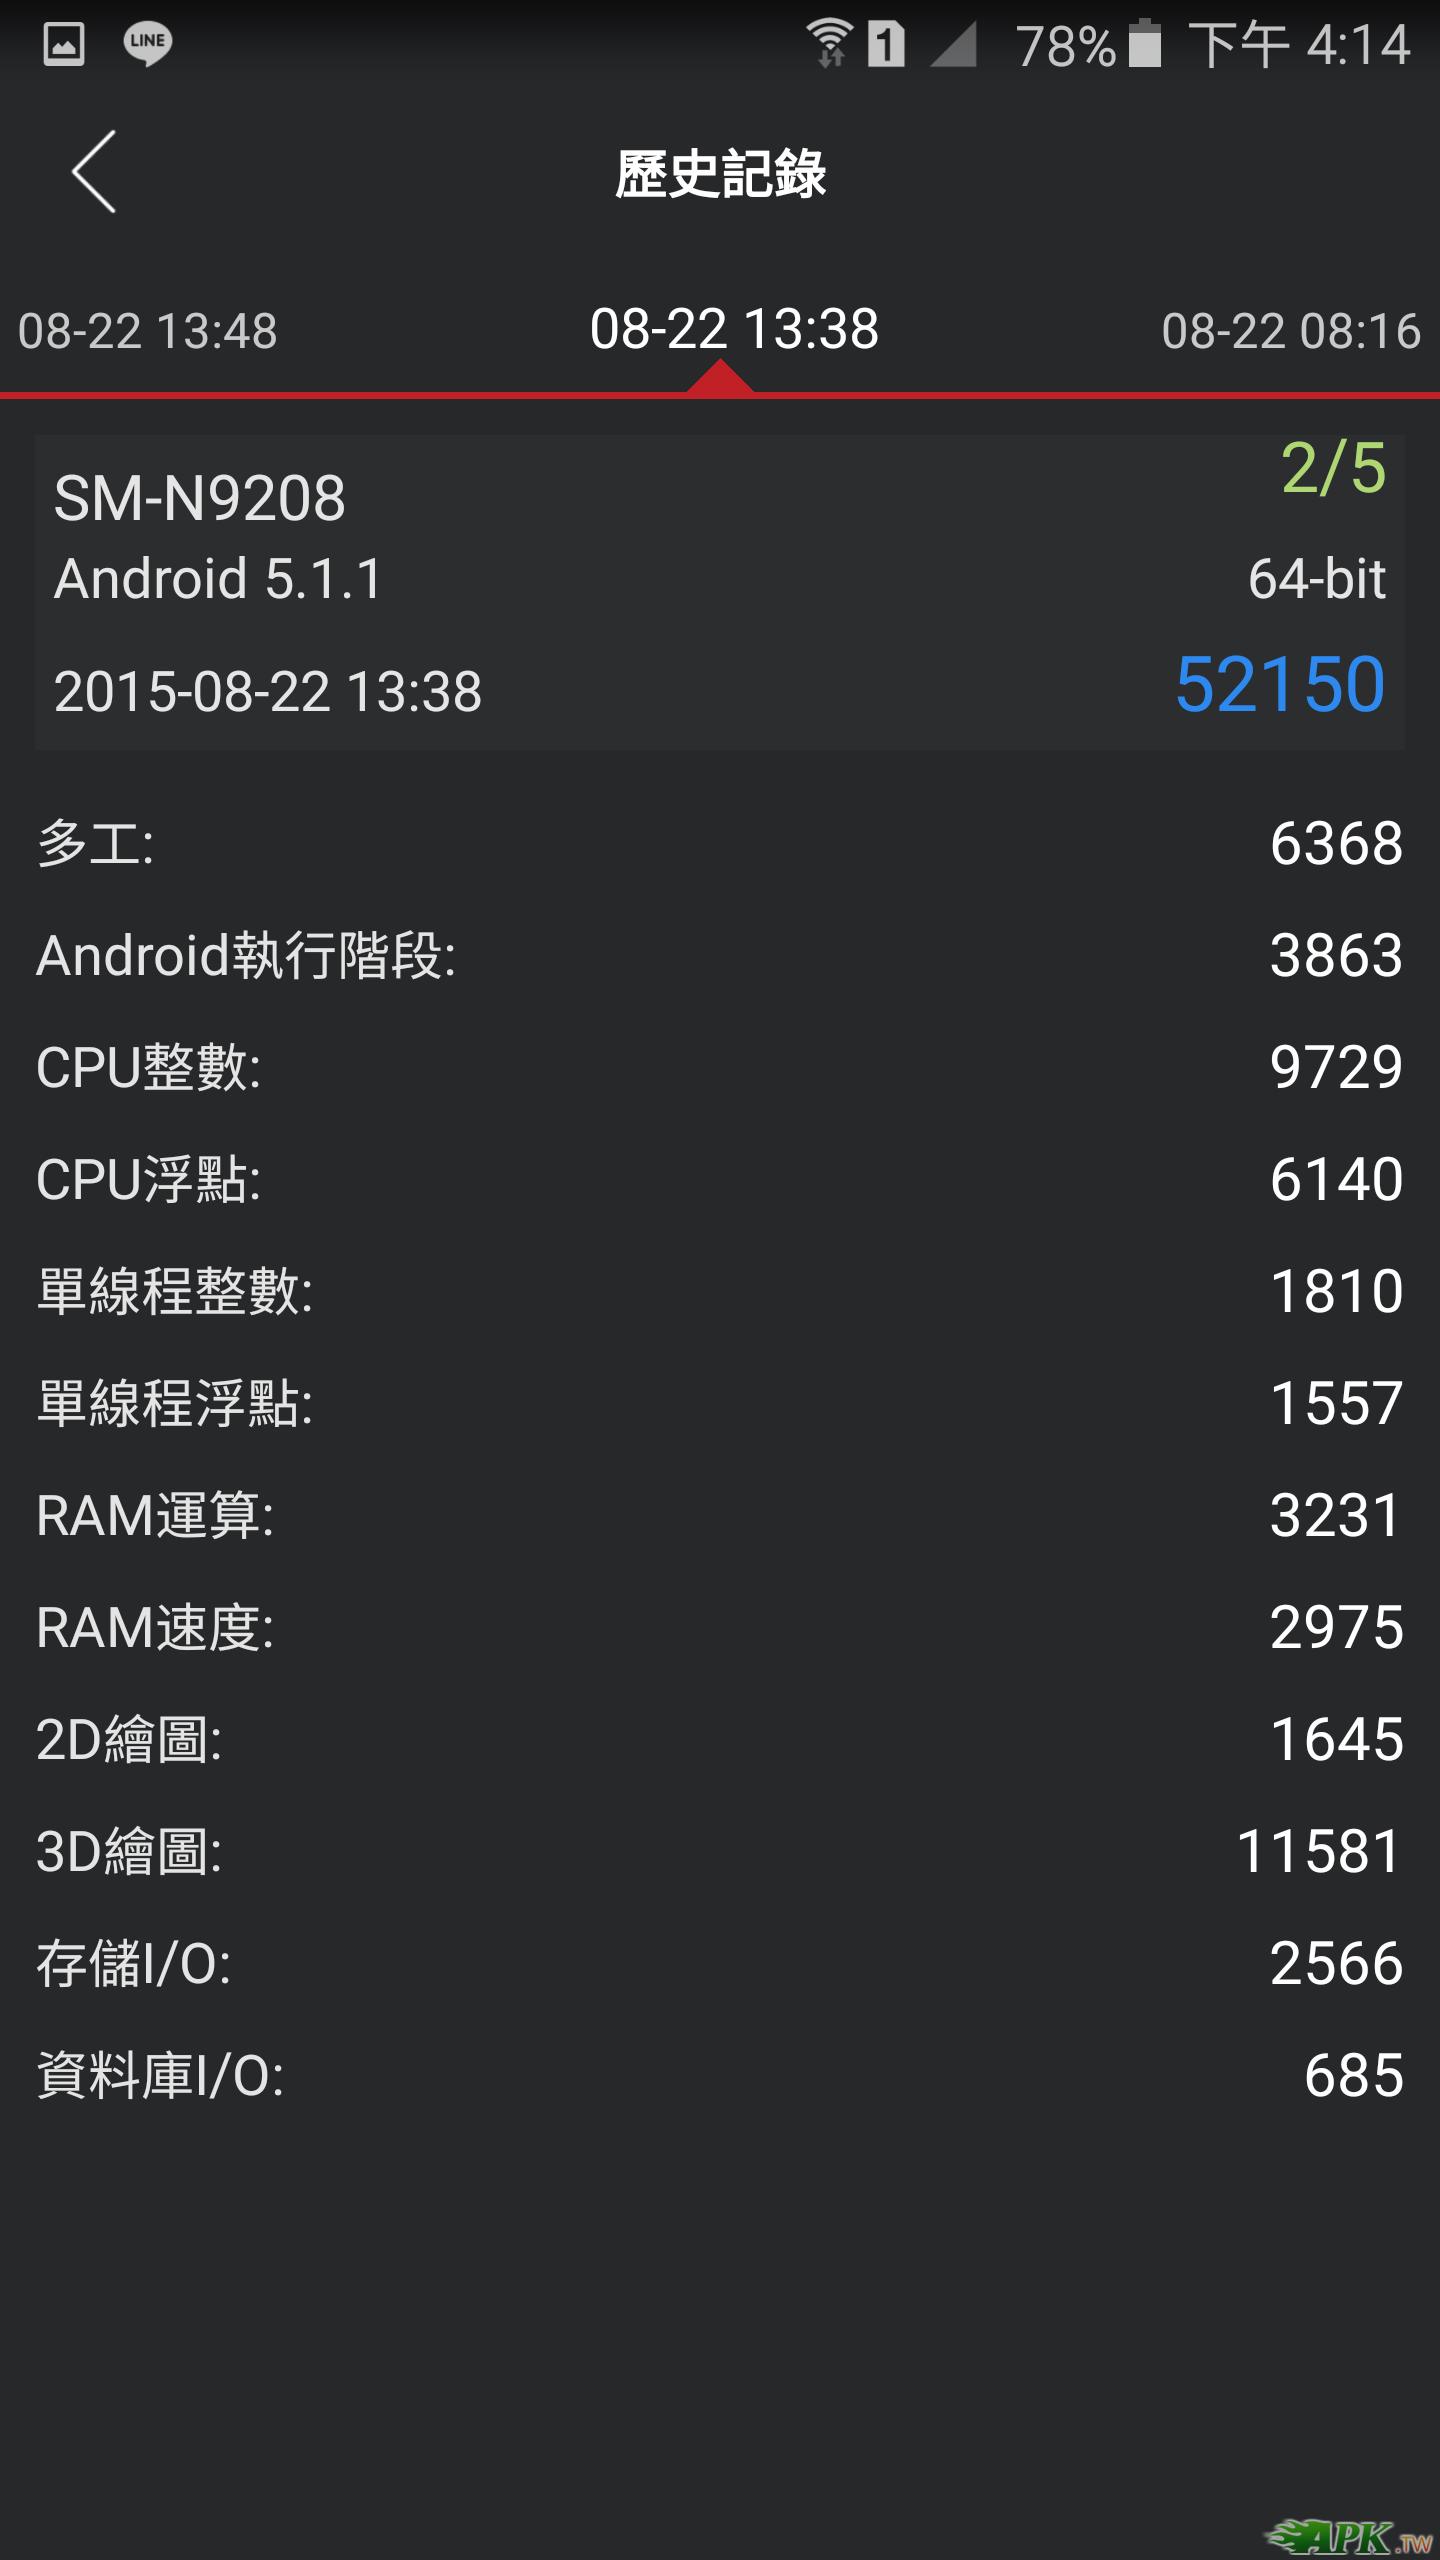 Screenshot_2015-08-22-16-14-58.png